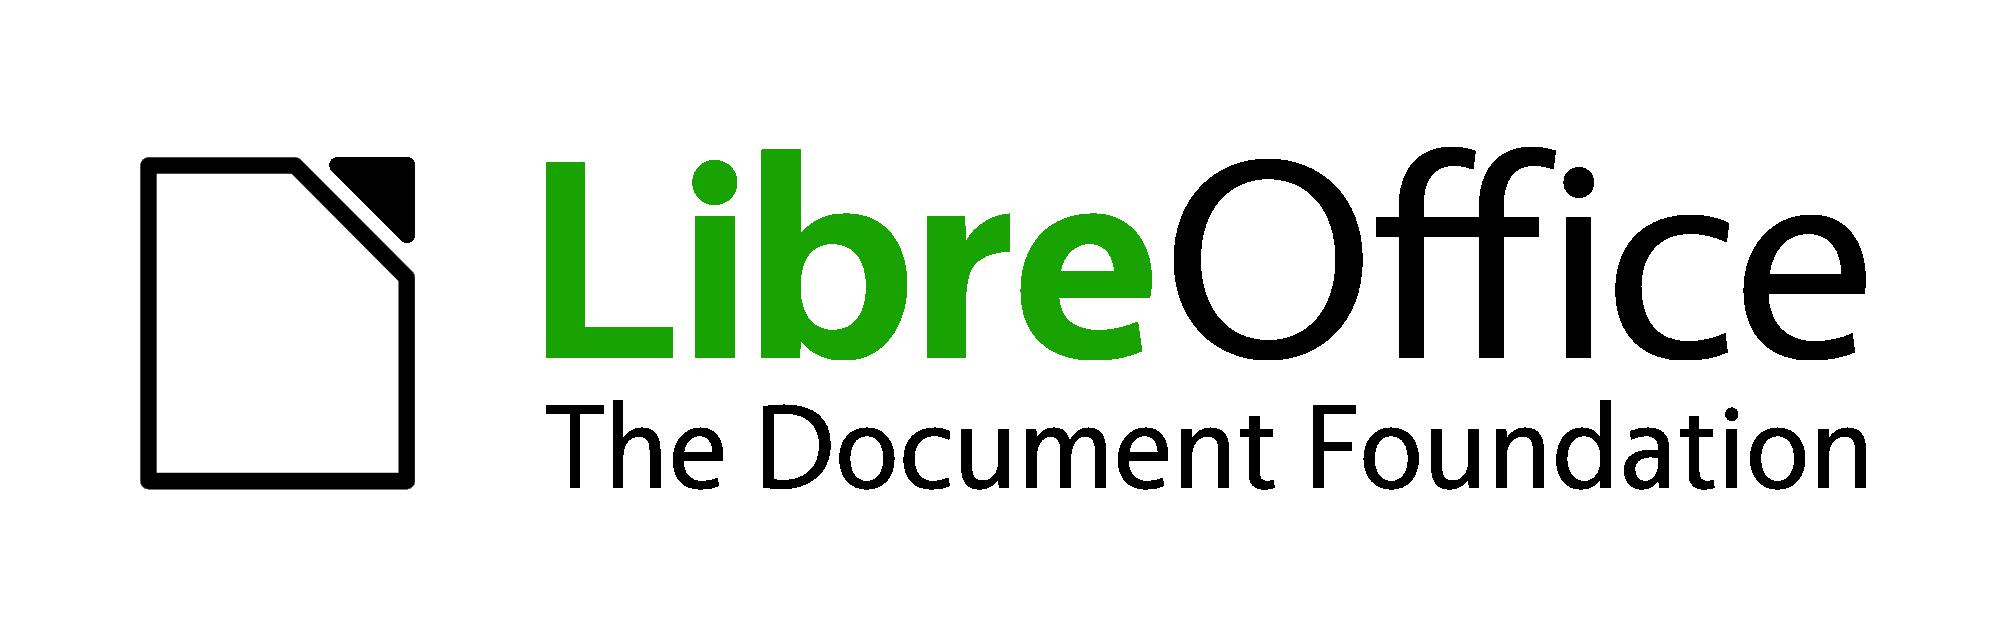 LibreOffice_Initial-Artwork-Logo_ColorLogoBasic_2000px